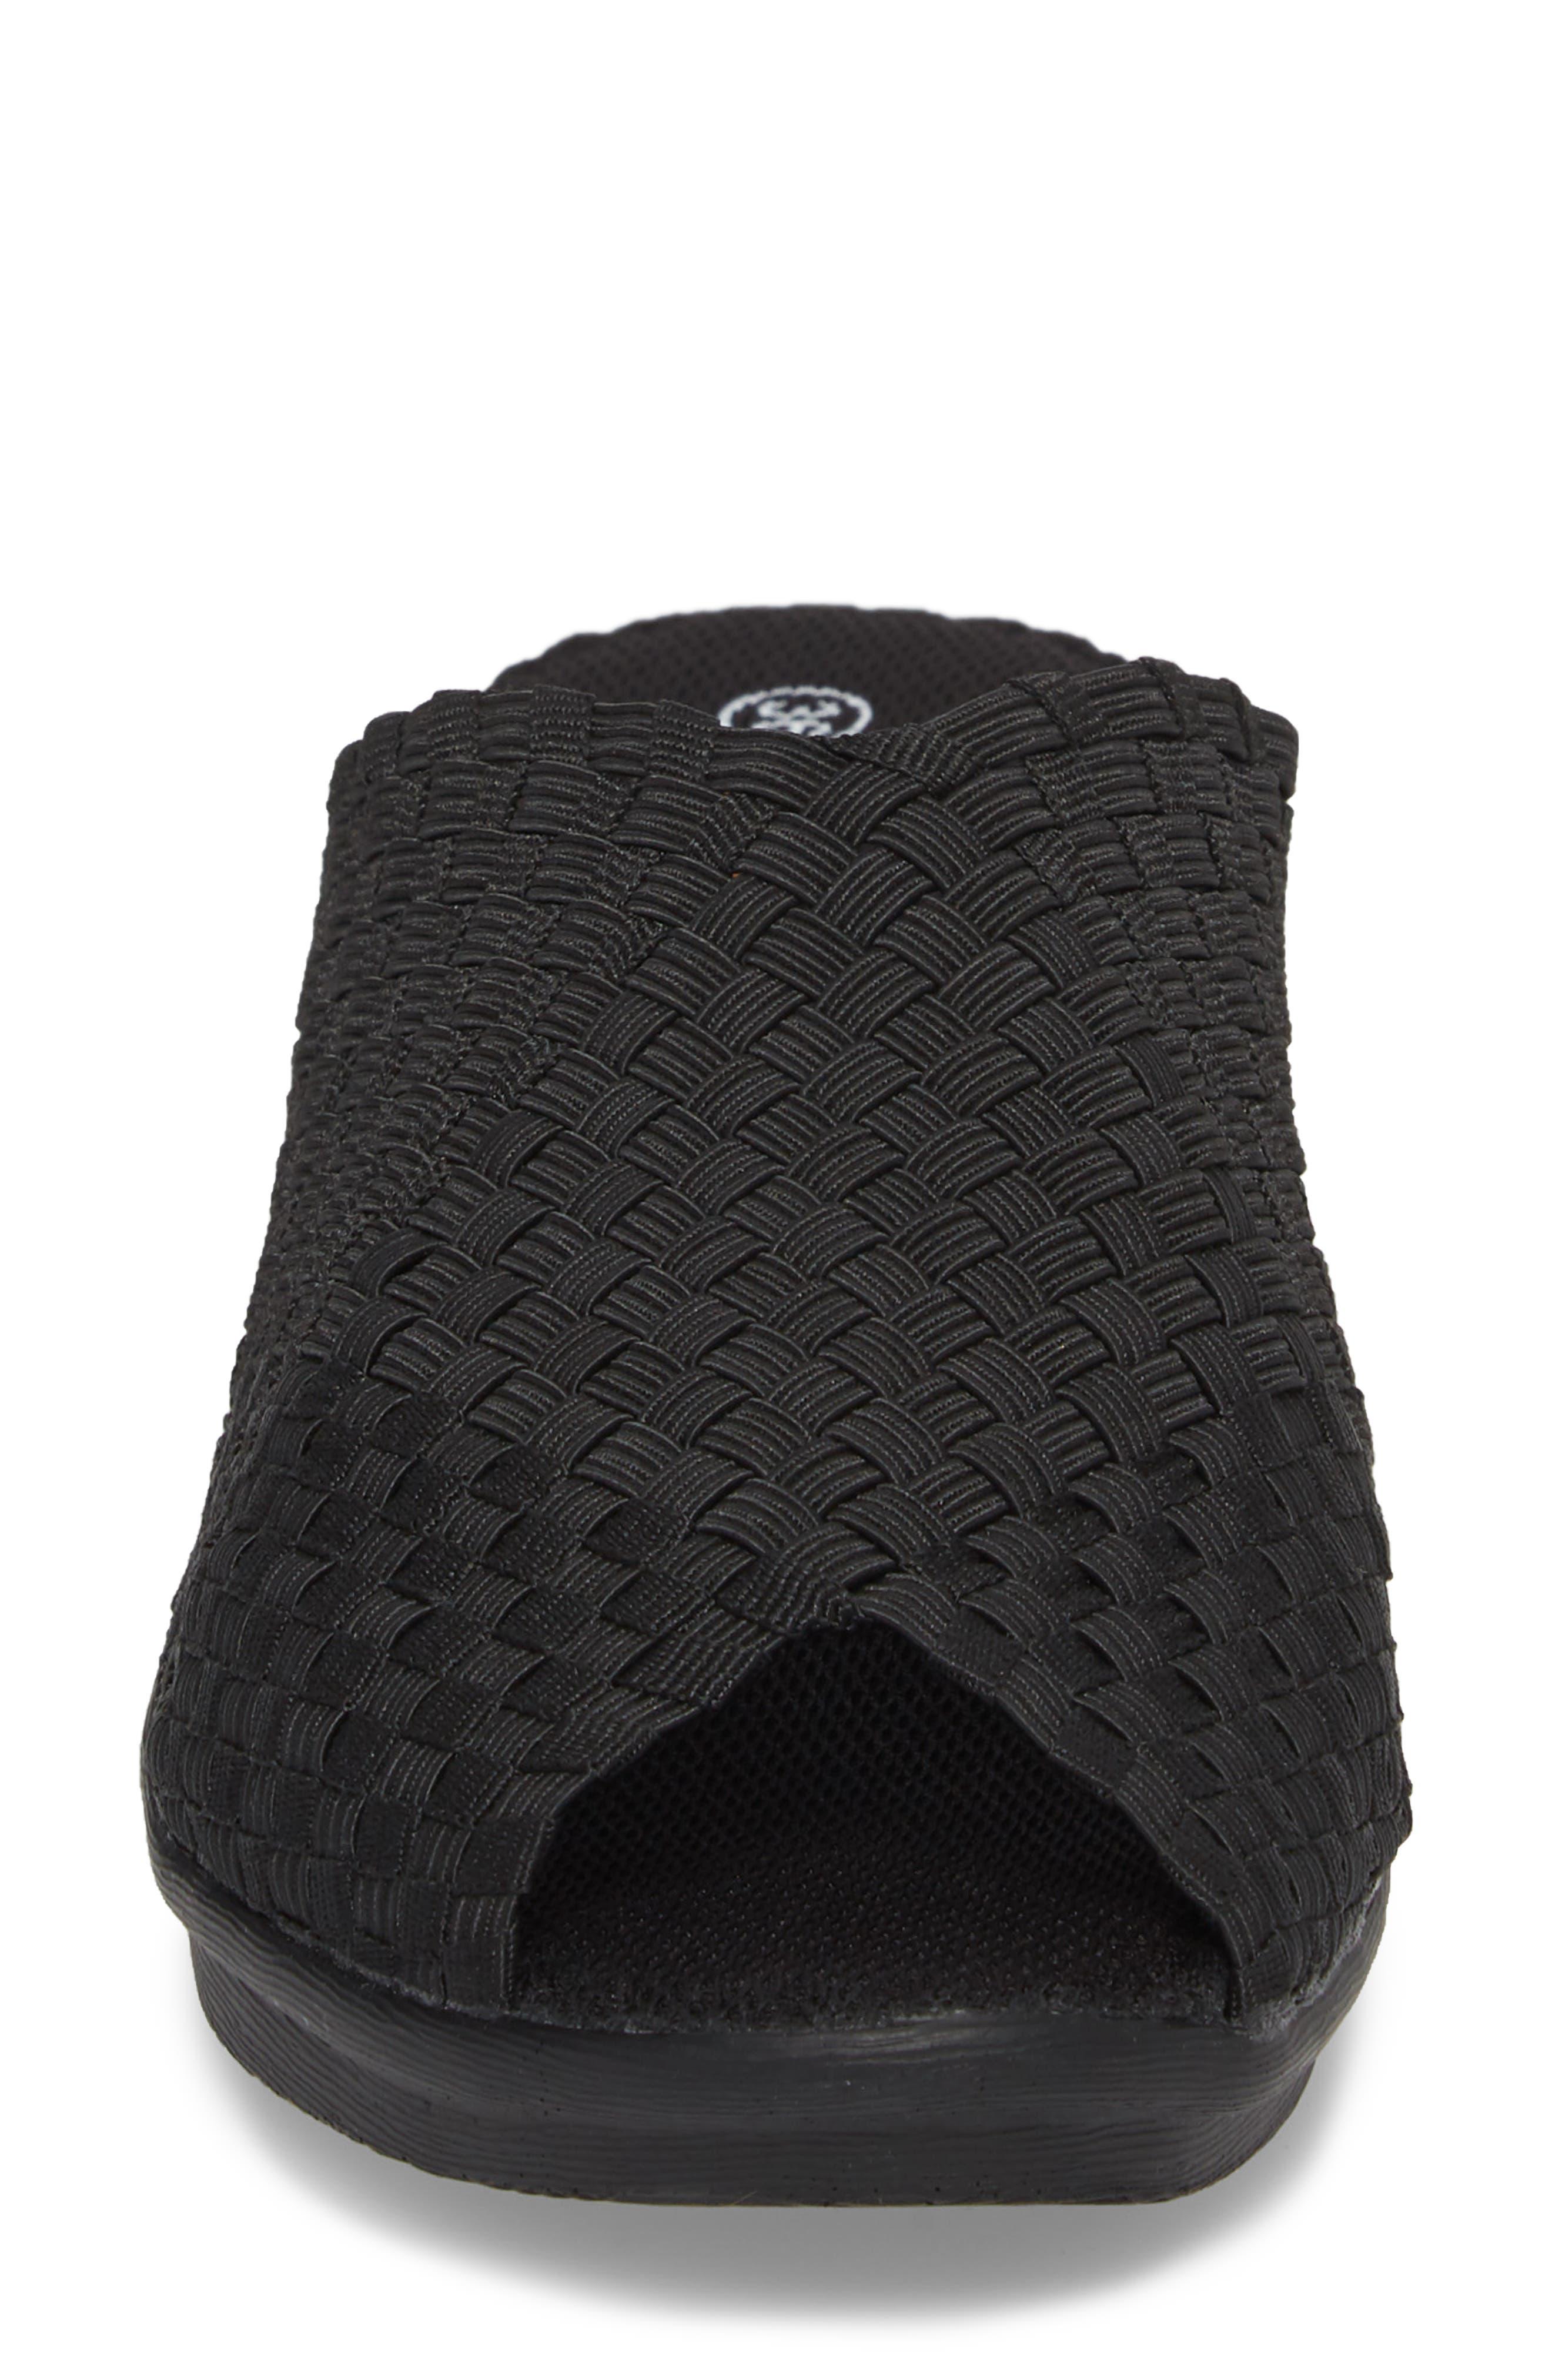 Cyrene Wedge Sandal,                             Alternate thumbnail 4, color,                             Black Fabric